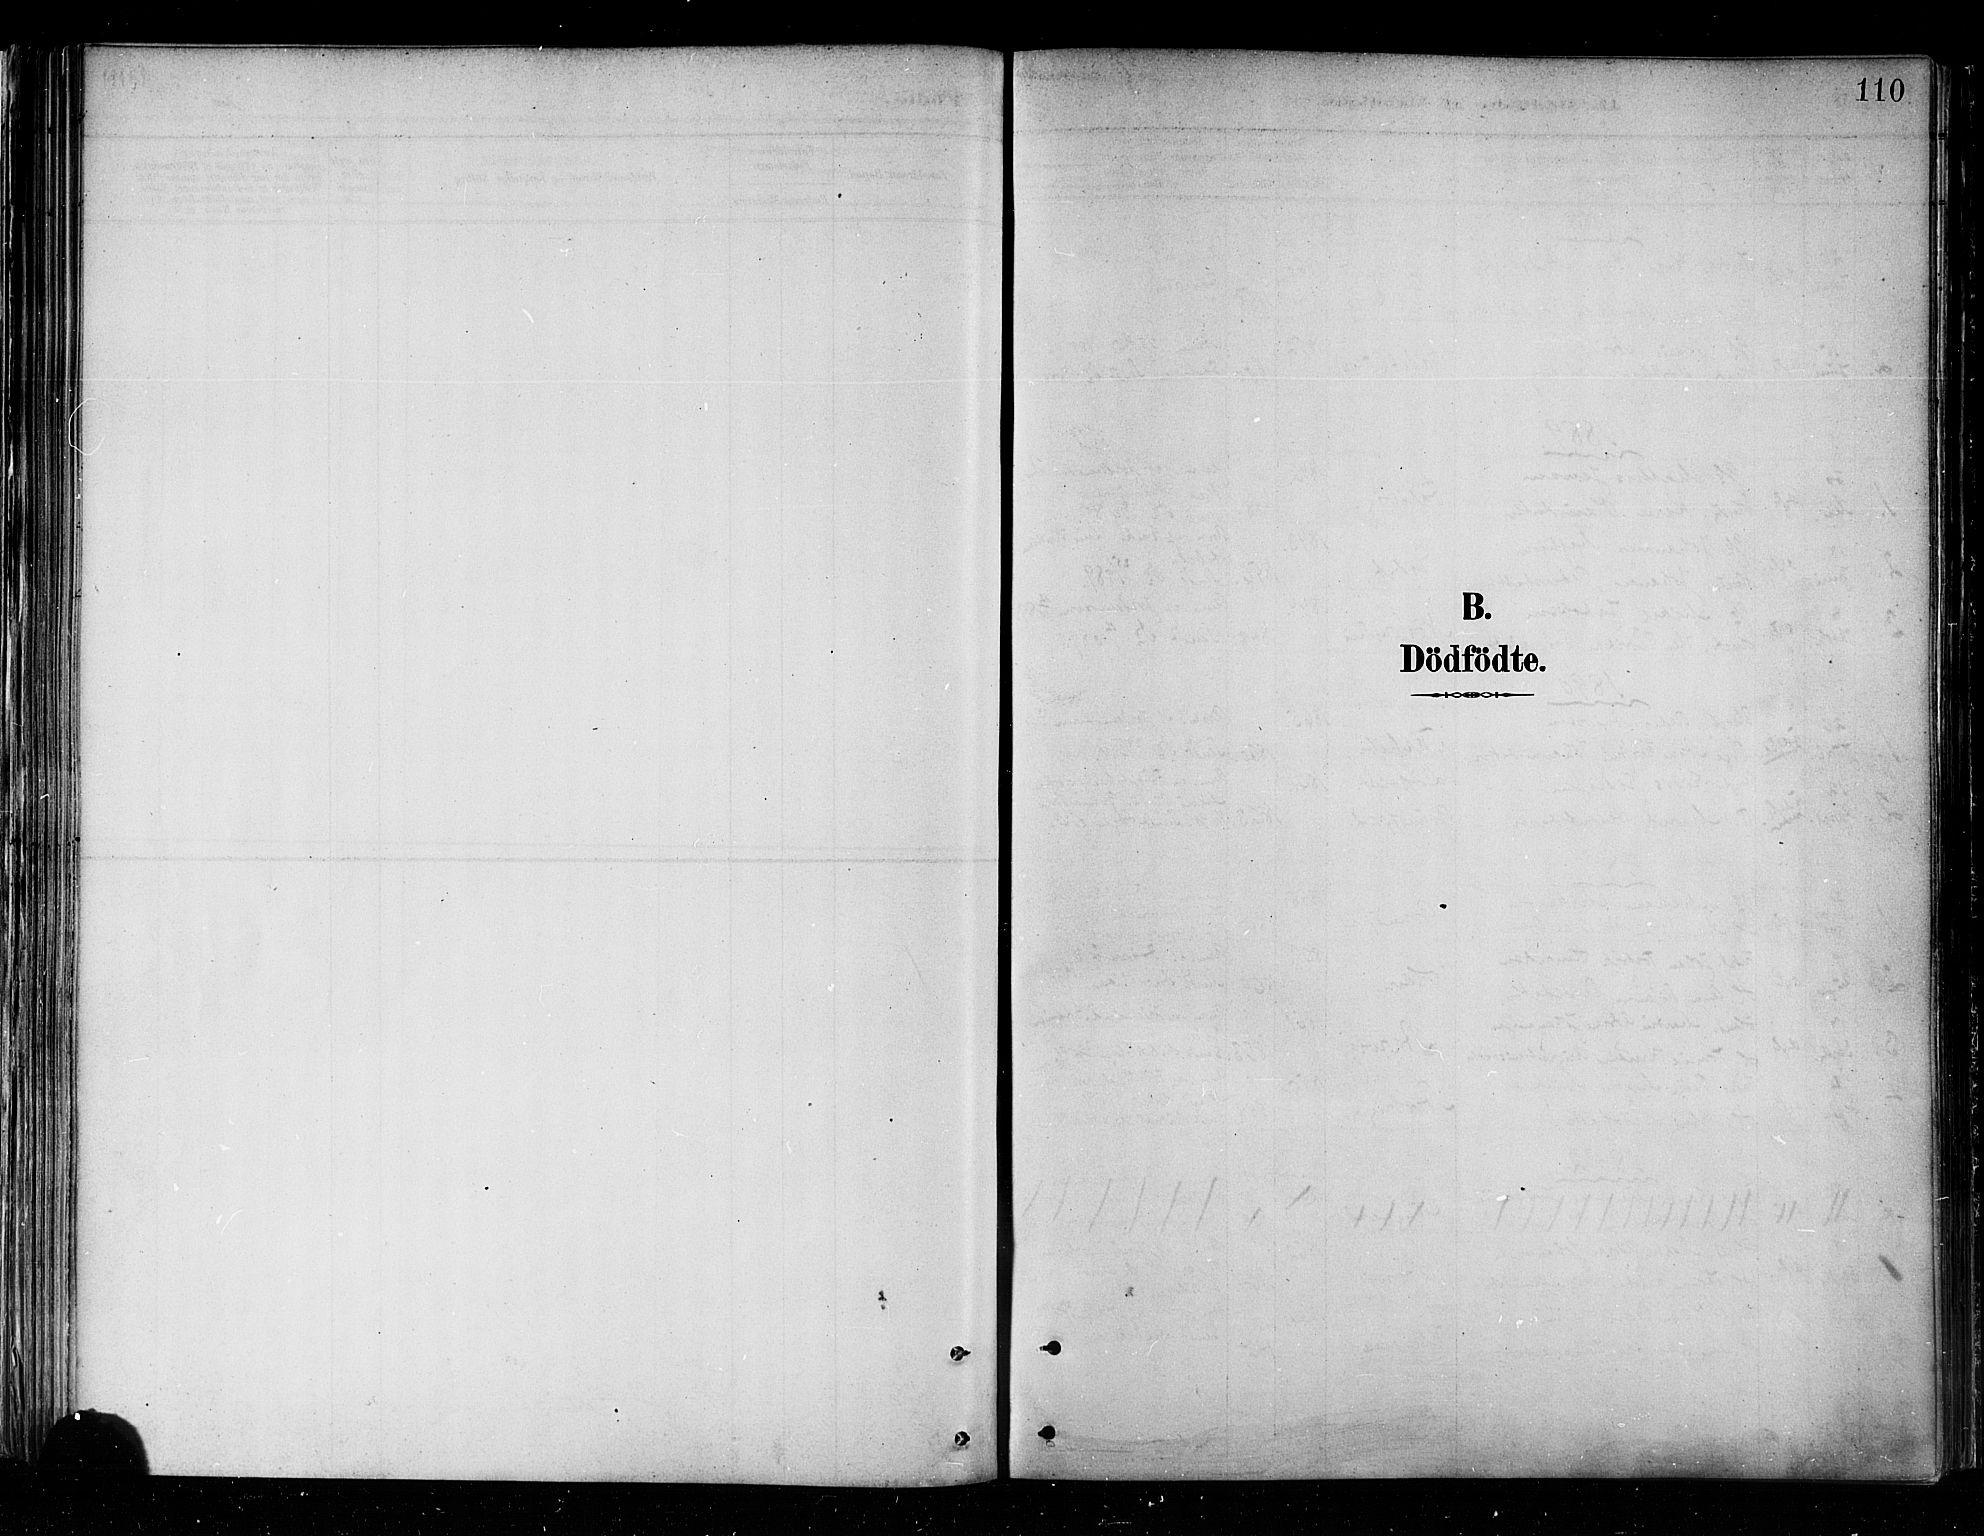 SATØ, Skjervøy sokneprestkontor, H/Ha/Haa/L0010kirke: Ministerialbok nr. 10, 1887-1898, s. 110